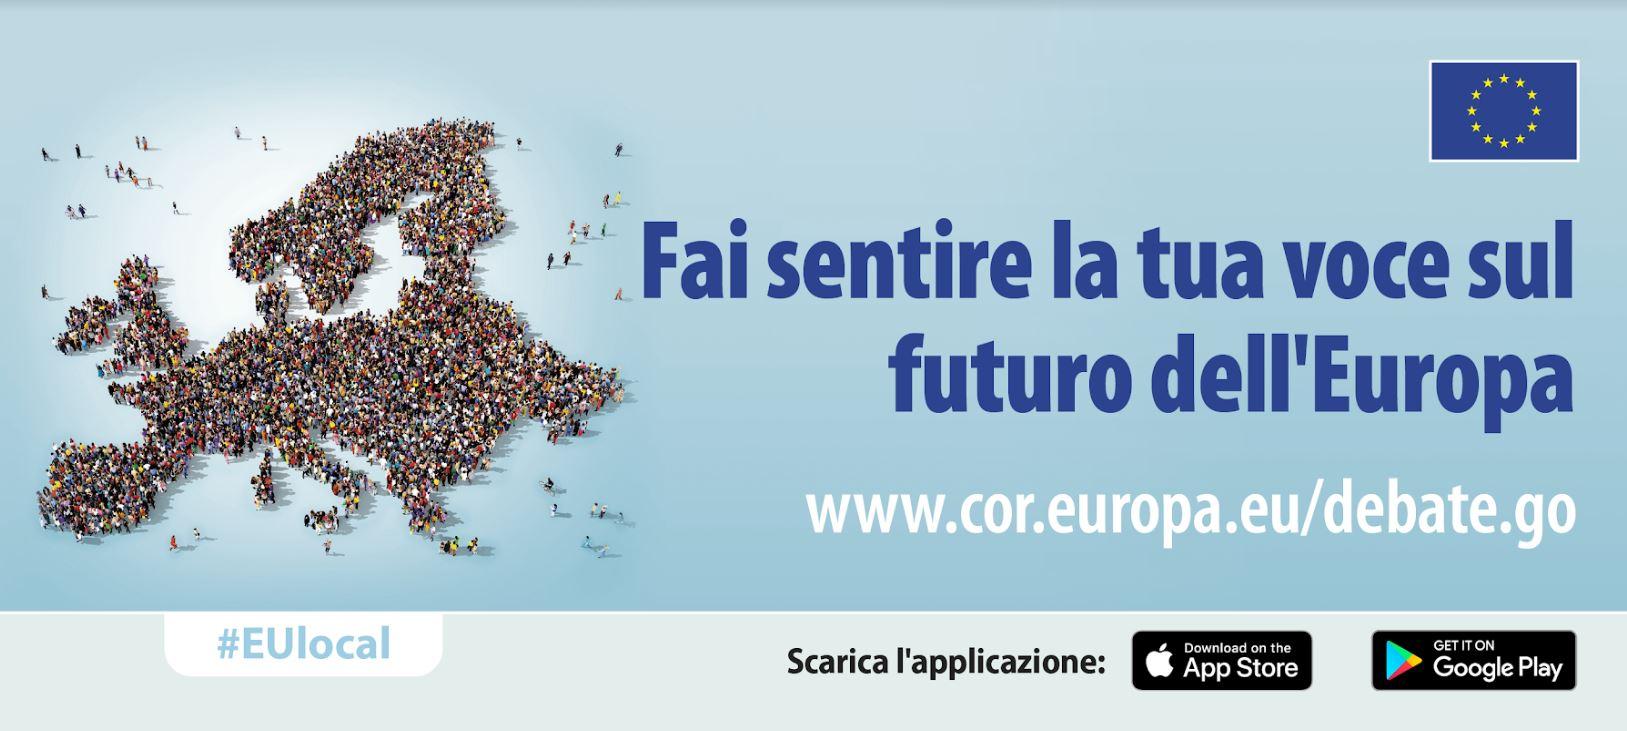 Paertecipa a Reflecting on Europe